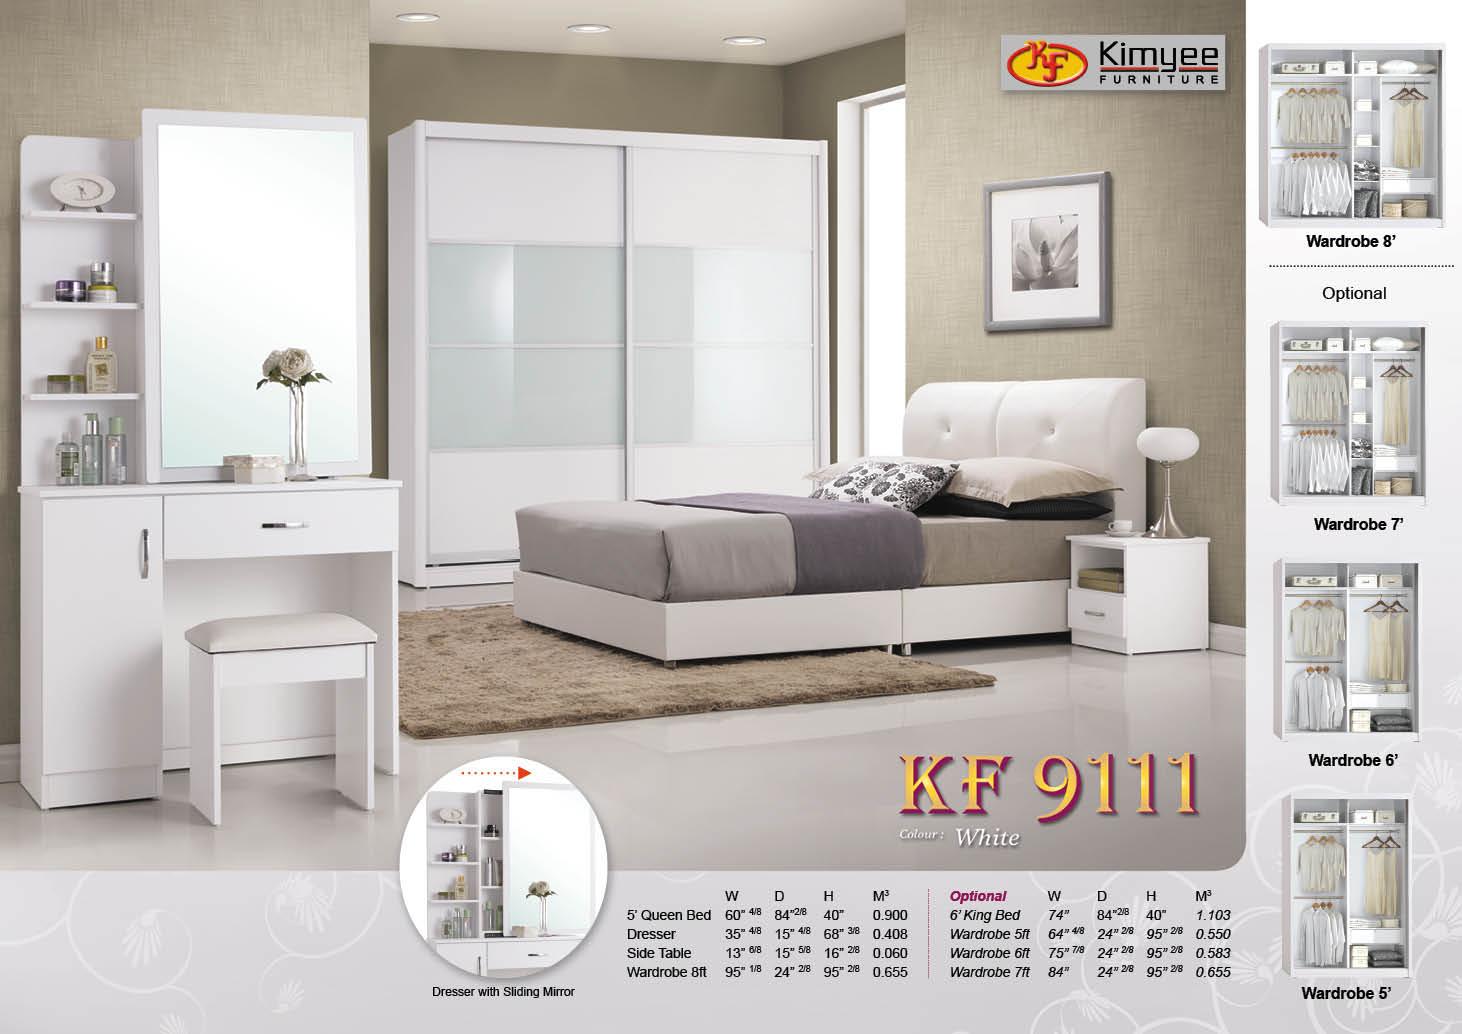 KF9111